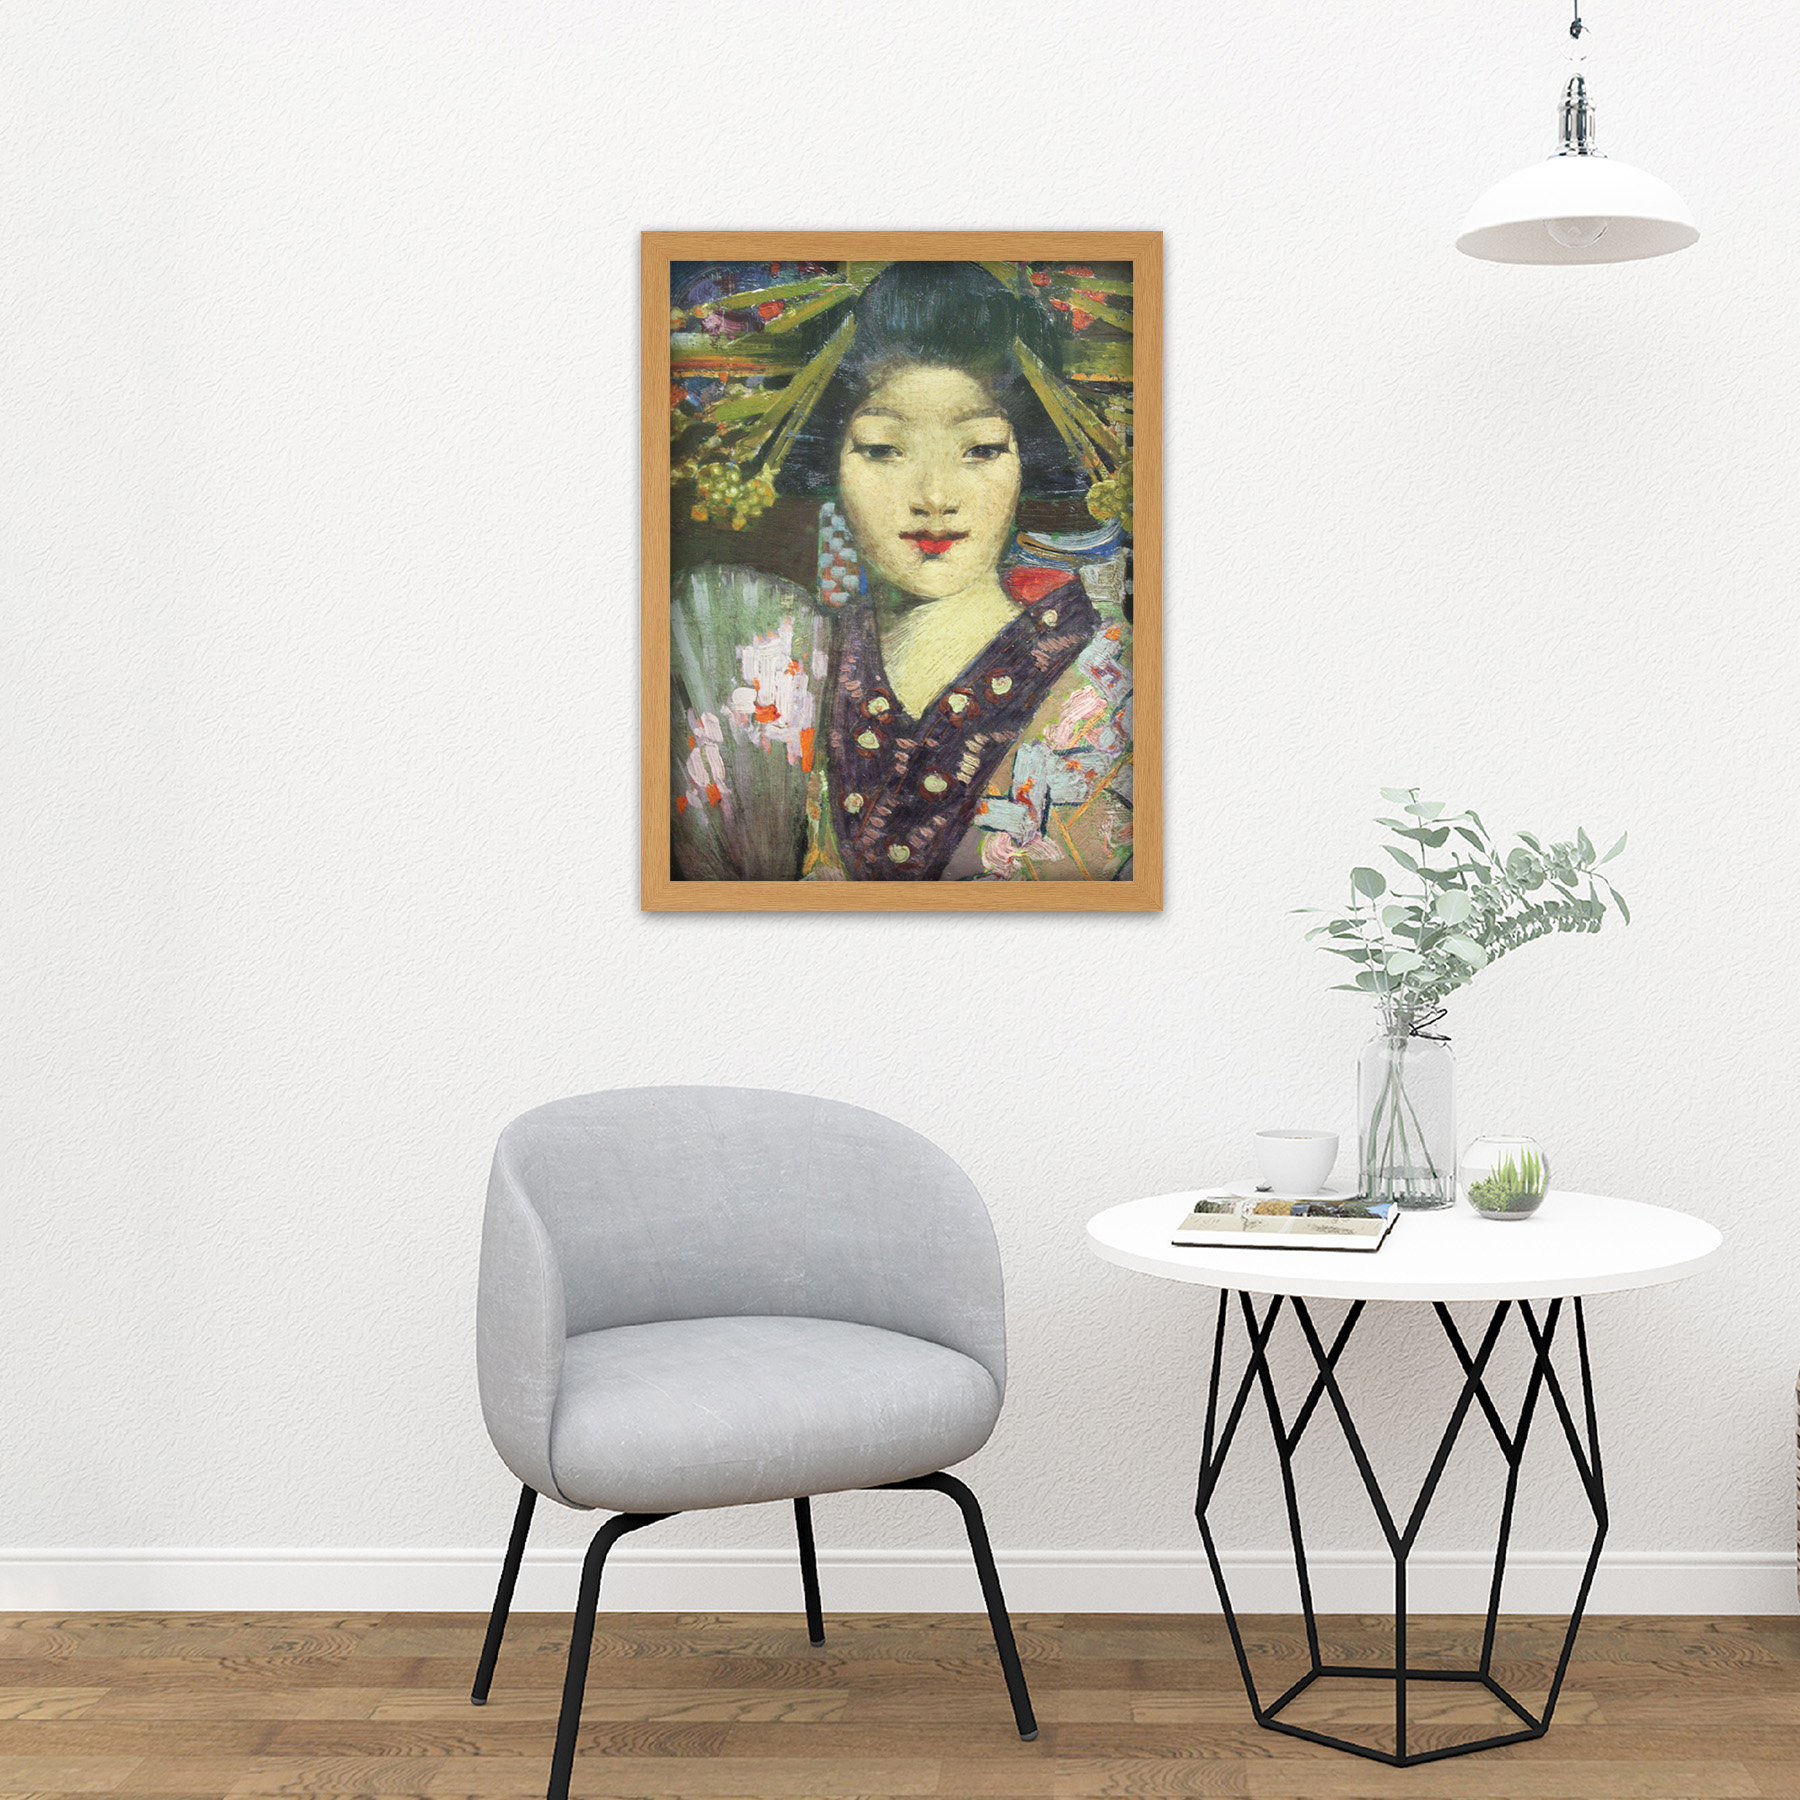 Henry-Geisha-Girl-Detail-Painting-Large-Framed-Art-Print thumbnail 18